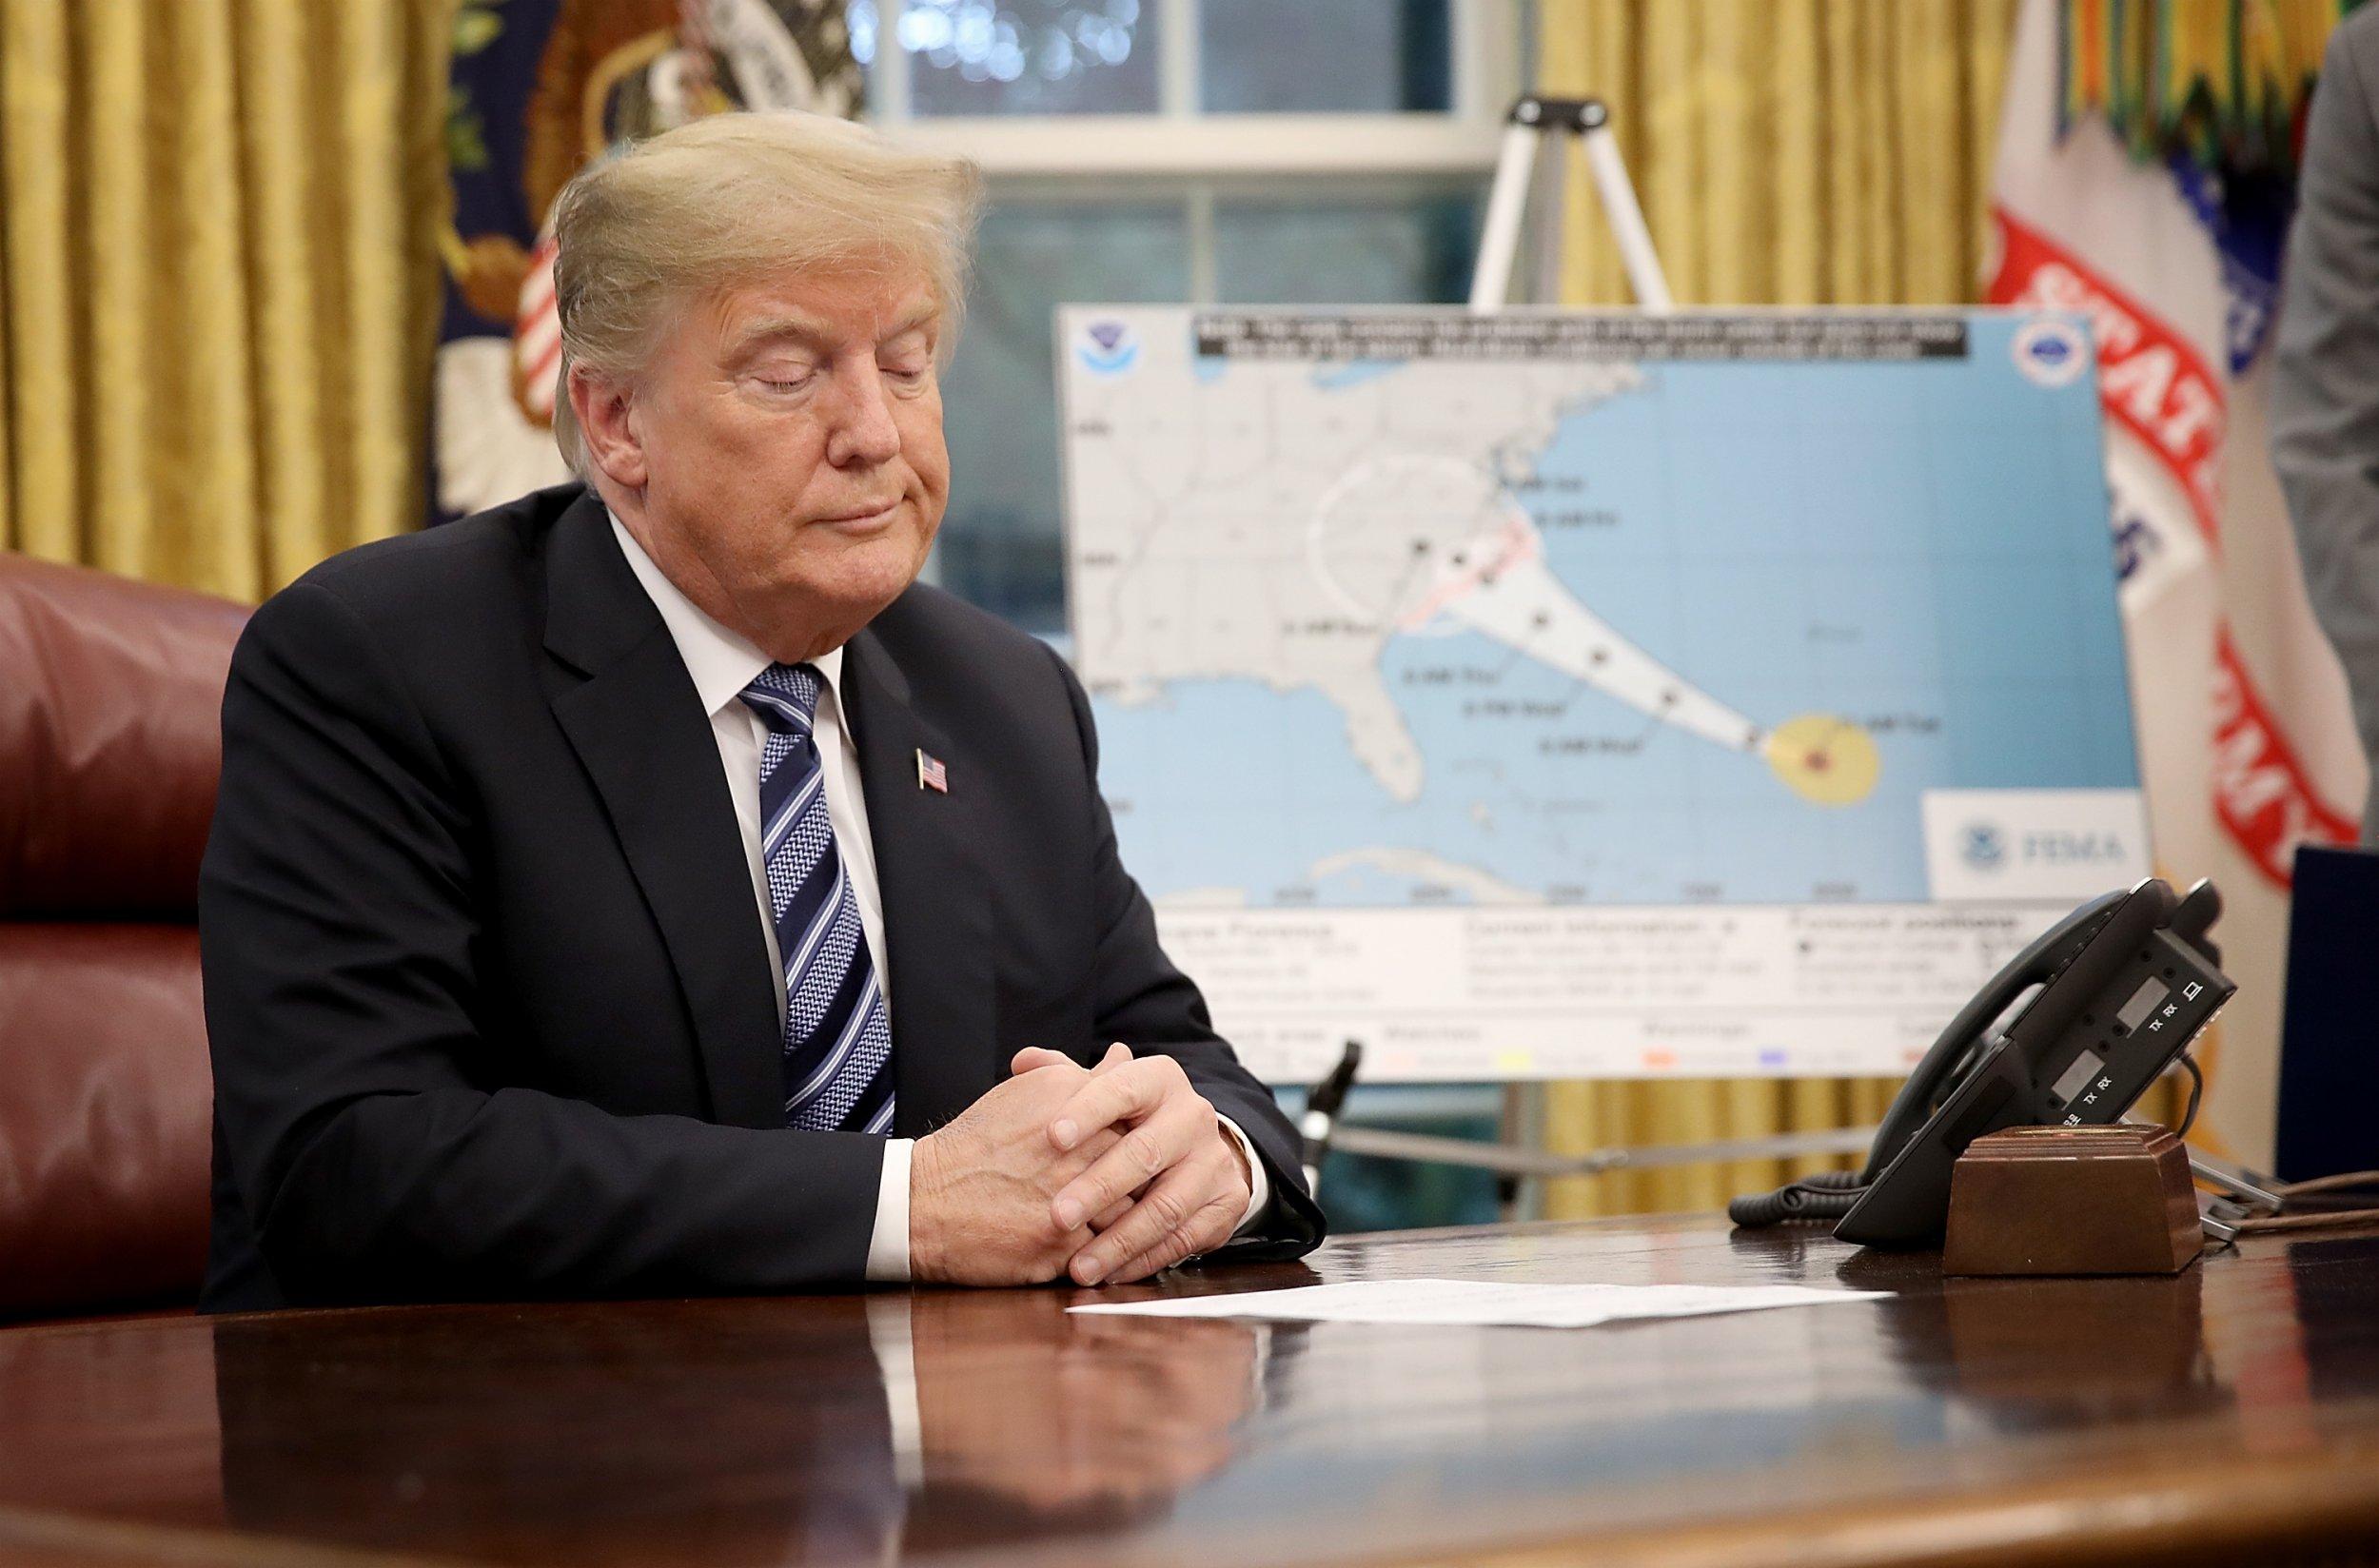 Donald Trump Democrats Rigged Puerto Rico Hurricane Maria Death Toll